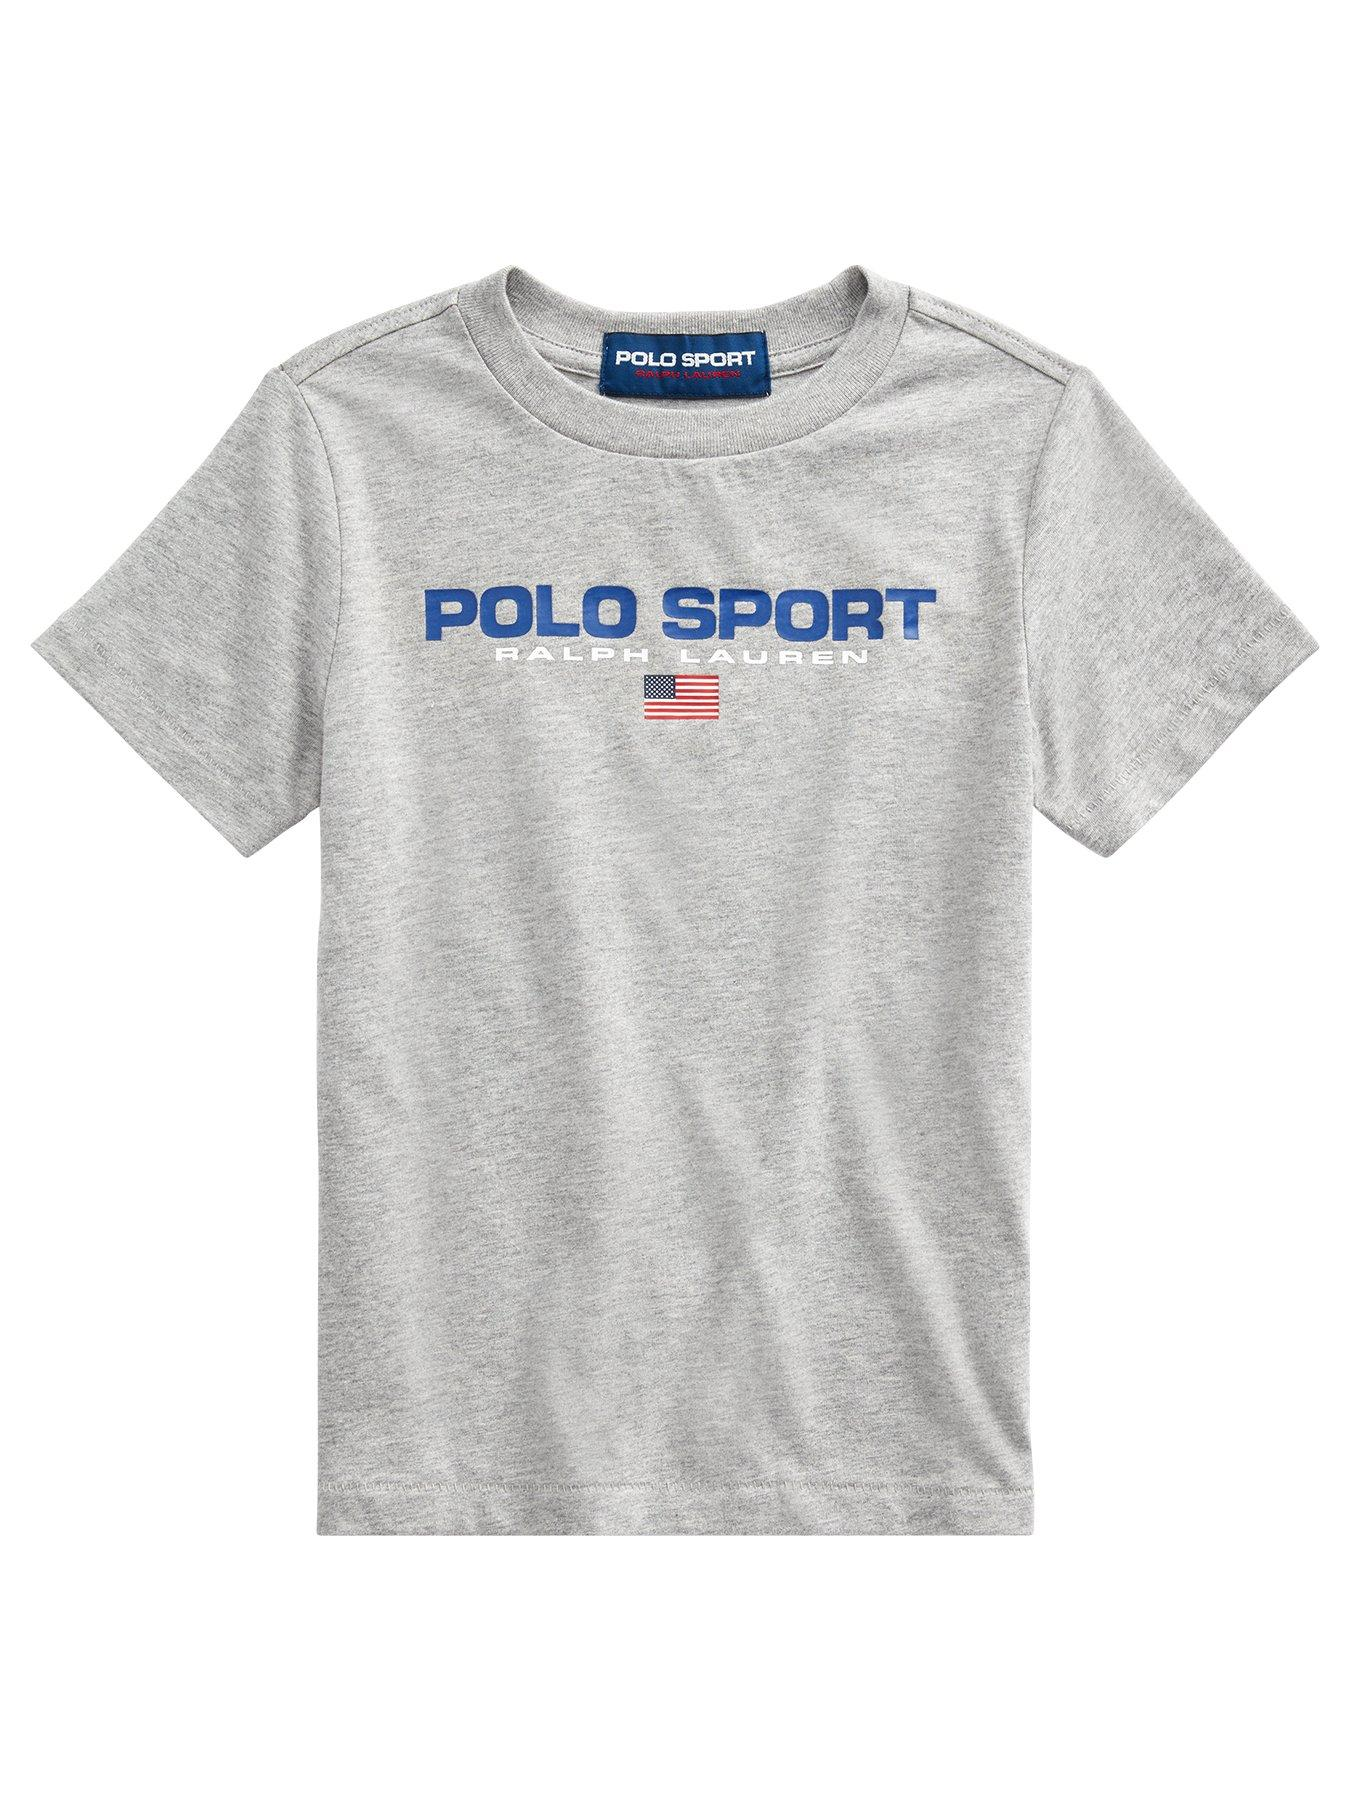 Ralph Lauren Boys Short Sleeve Polo Sport